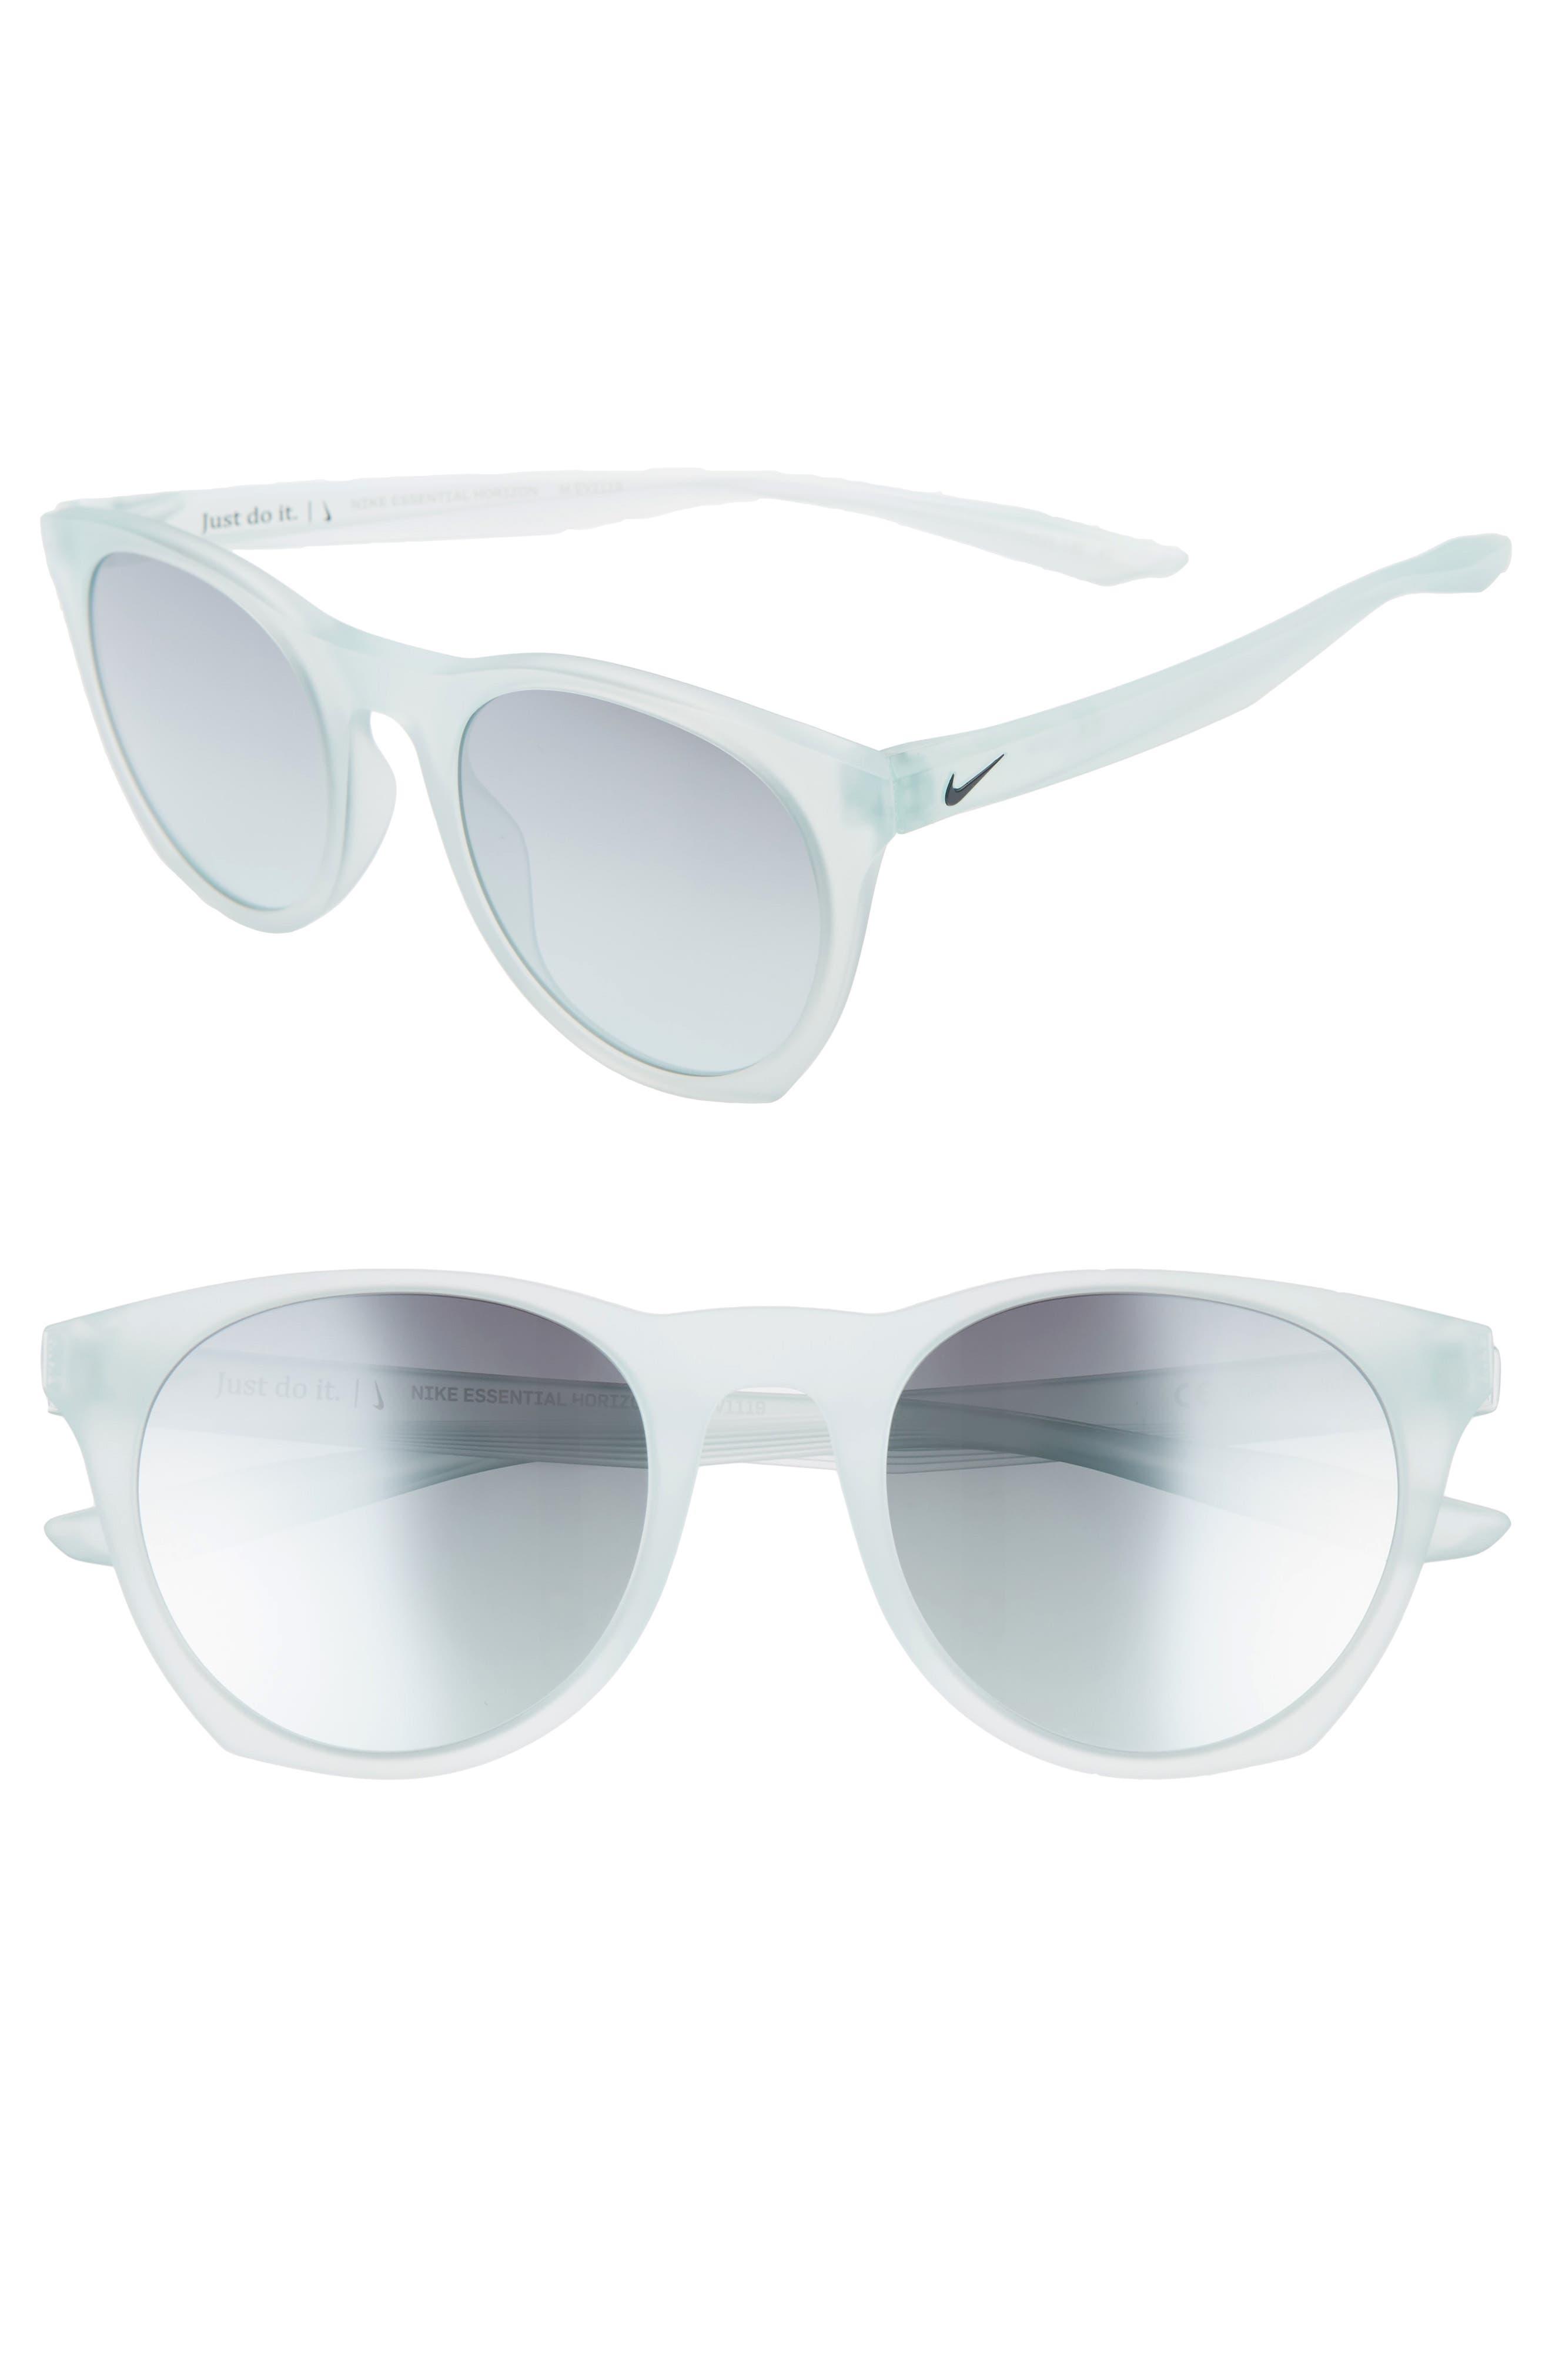 Nike Essential Horizon 51Mm Mirror Sunglasses - Matte Igloo/ Teal